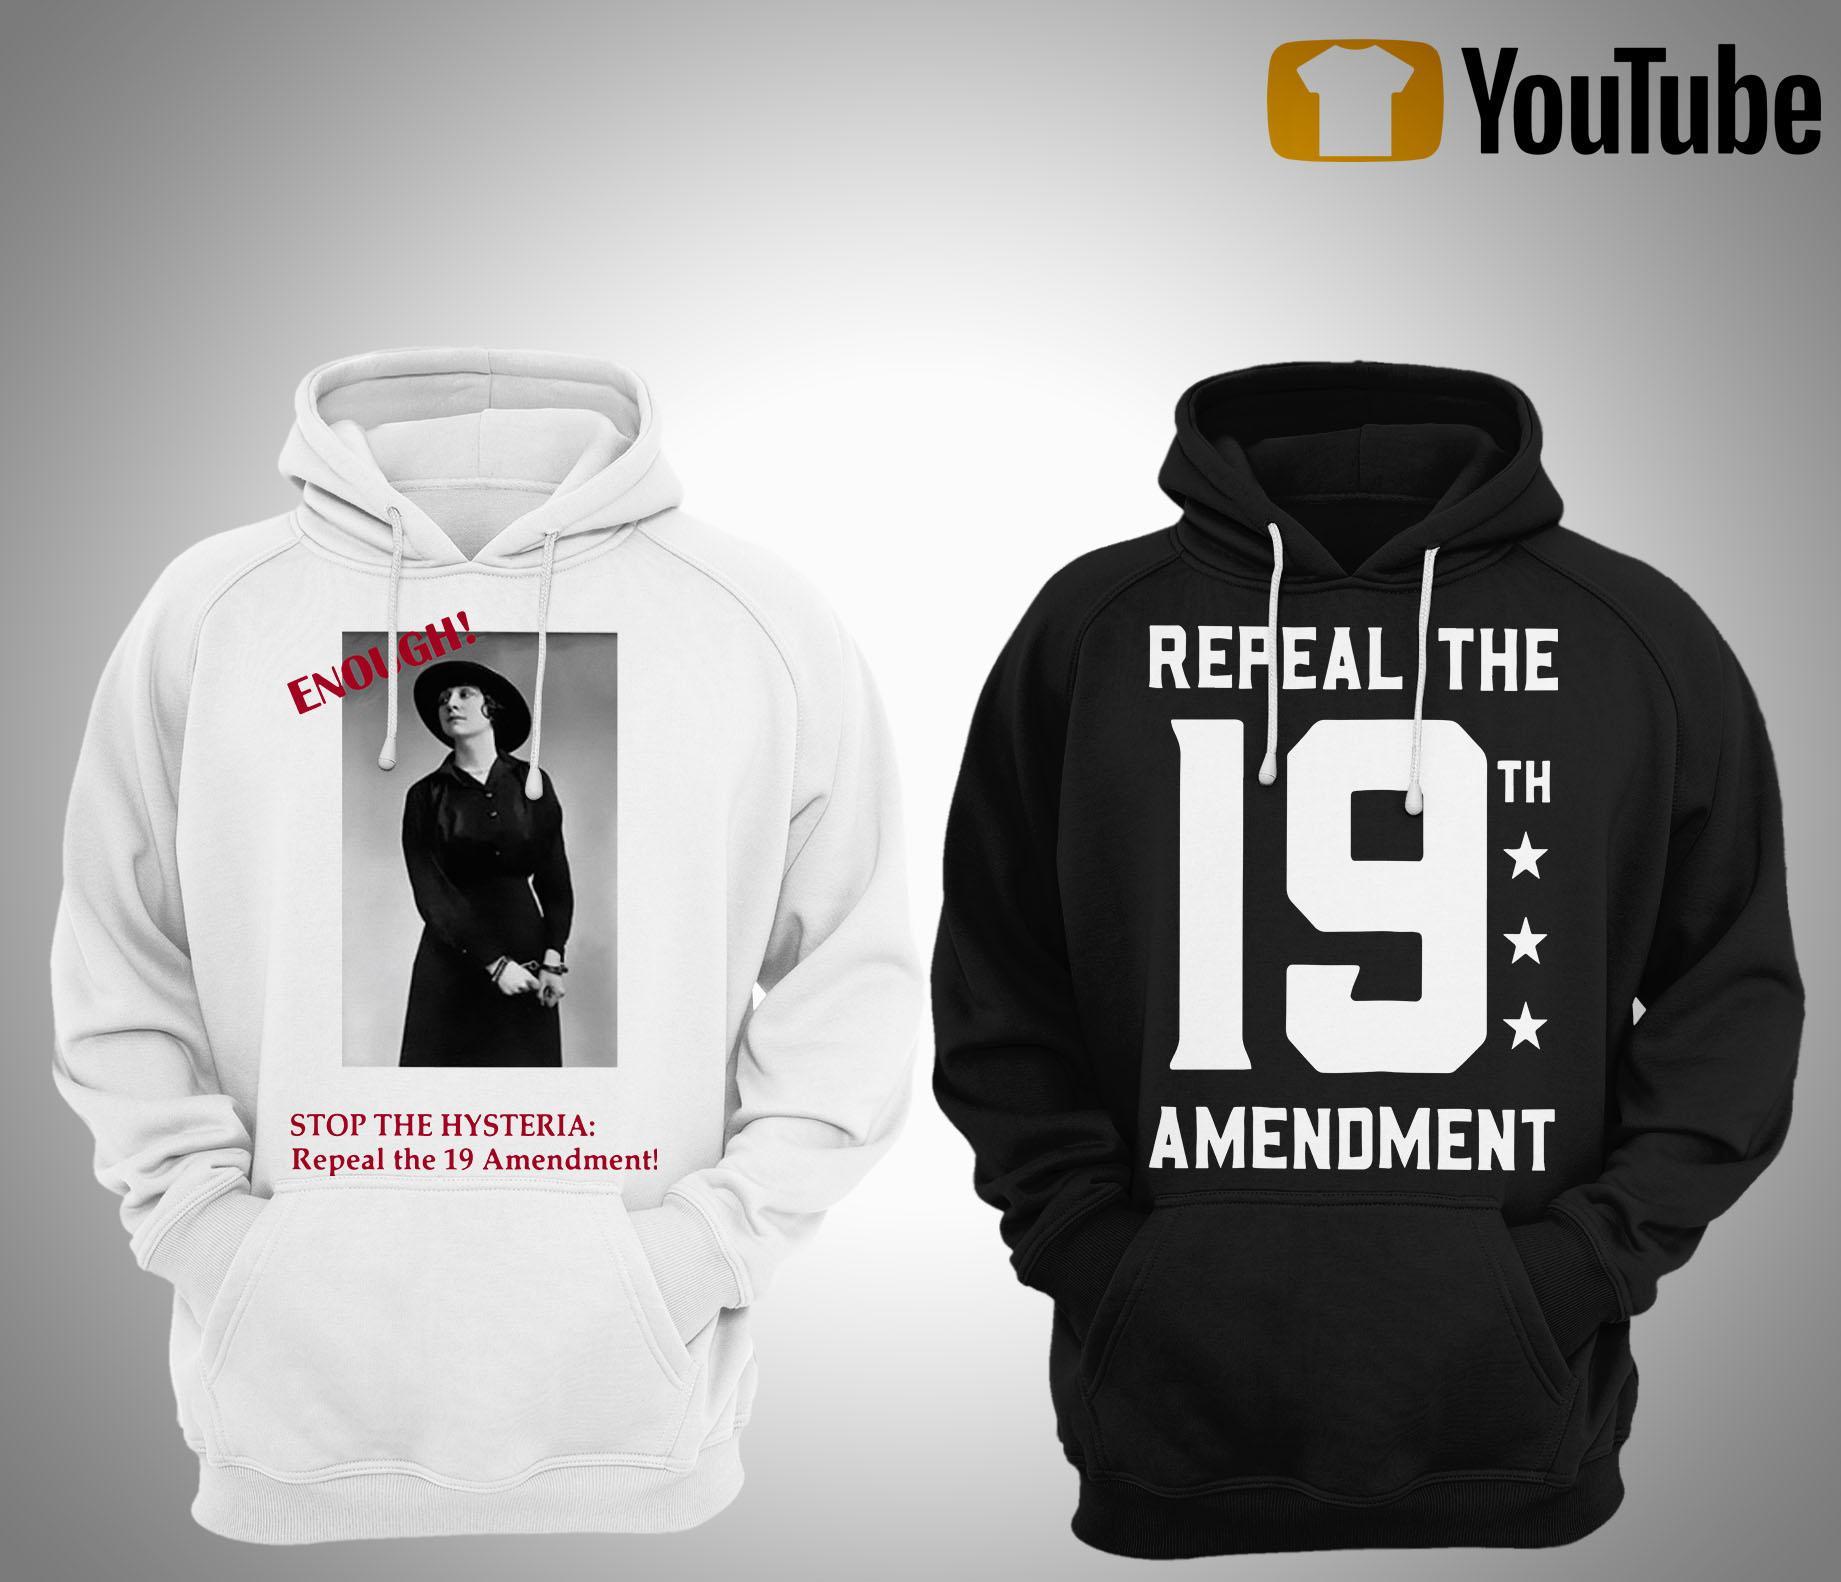 Repeal The 19th Amendment Hoodie